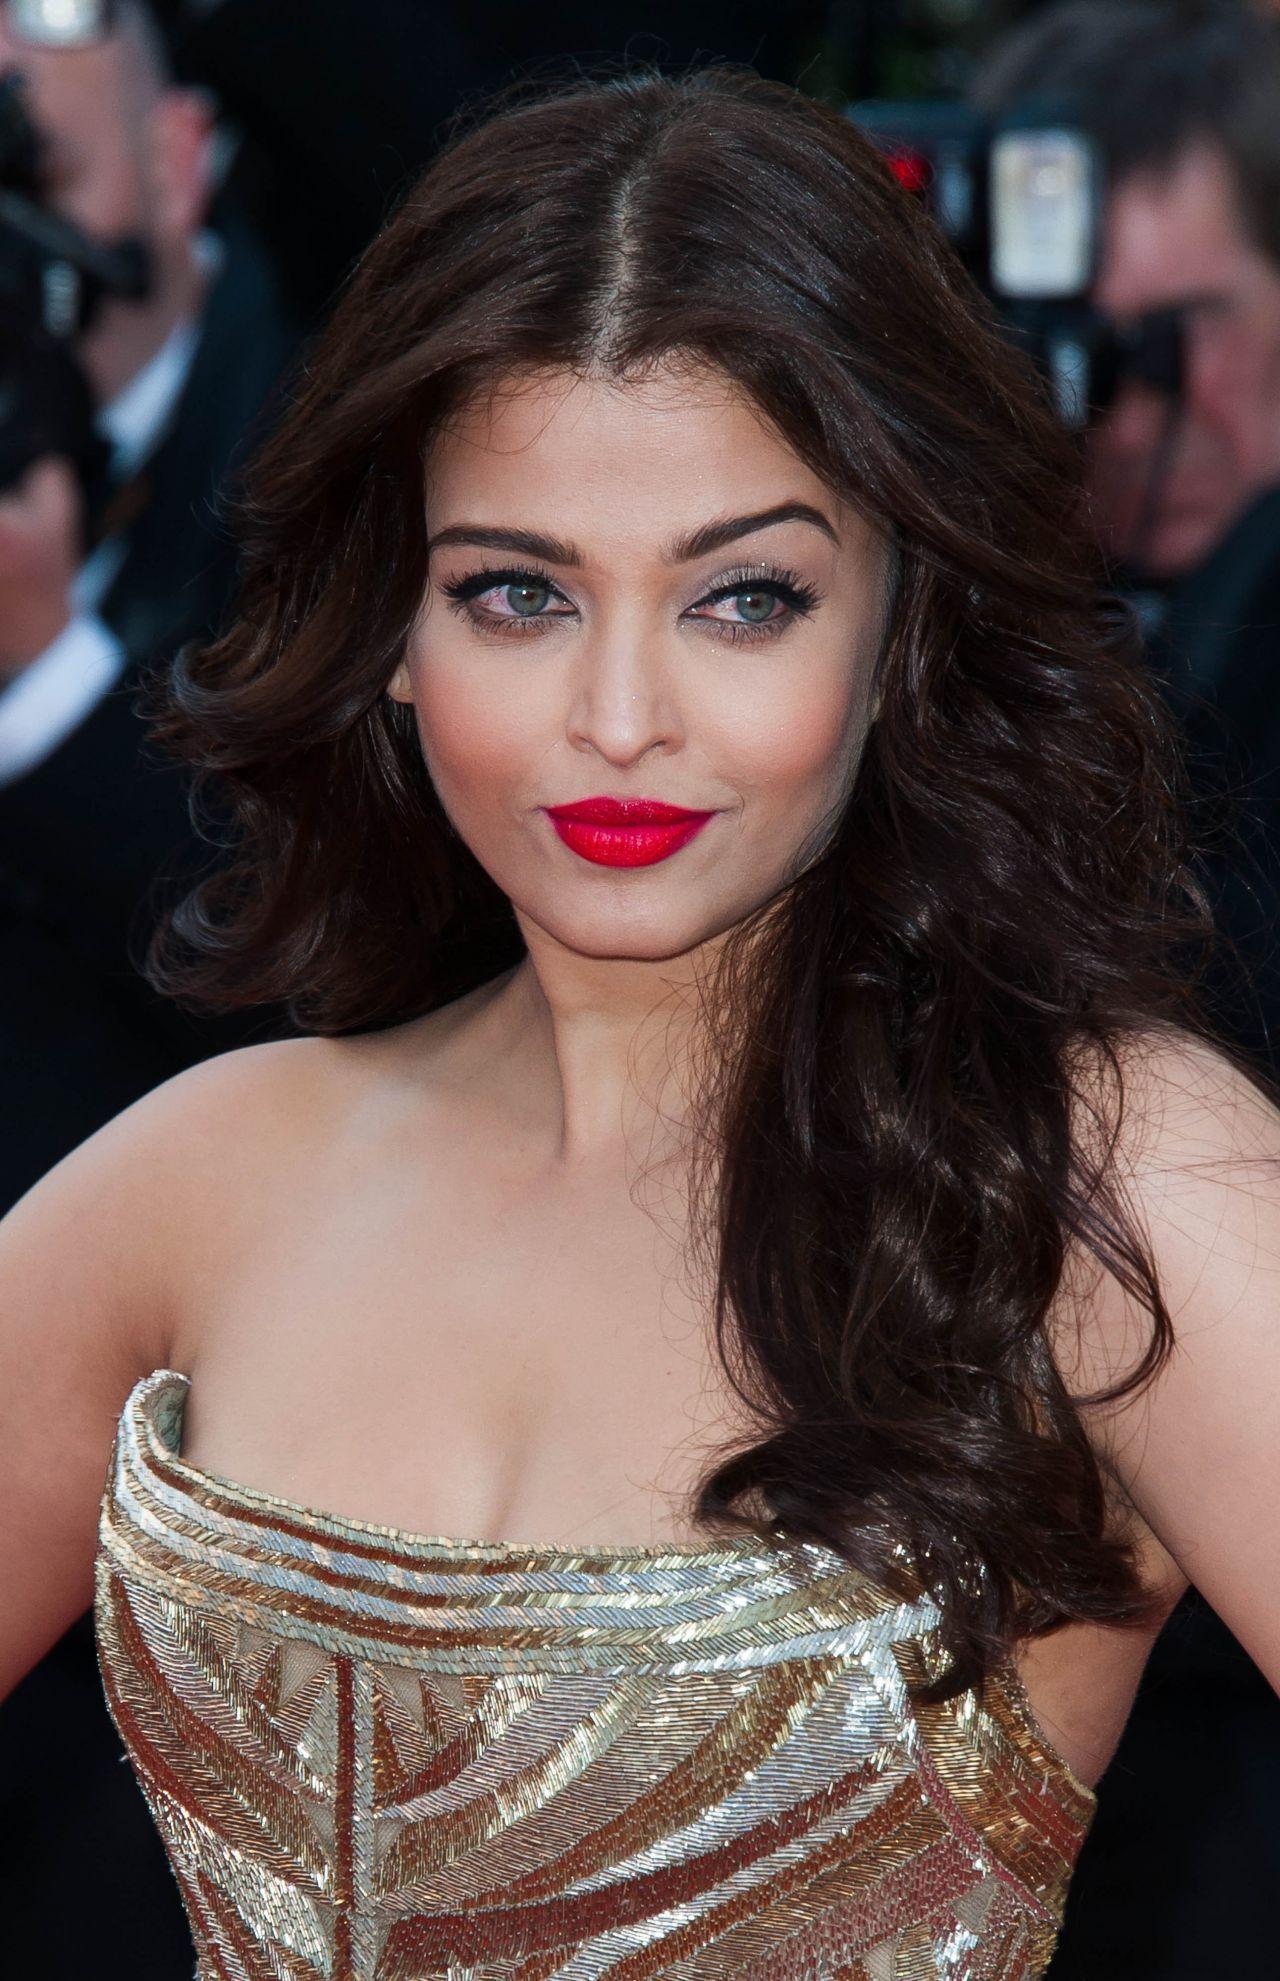 Cannes 2014: Aishwarya Rai Bachchan at Deux Jours Une Nuit ... |Aishwarya Rai 2014 March